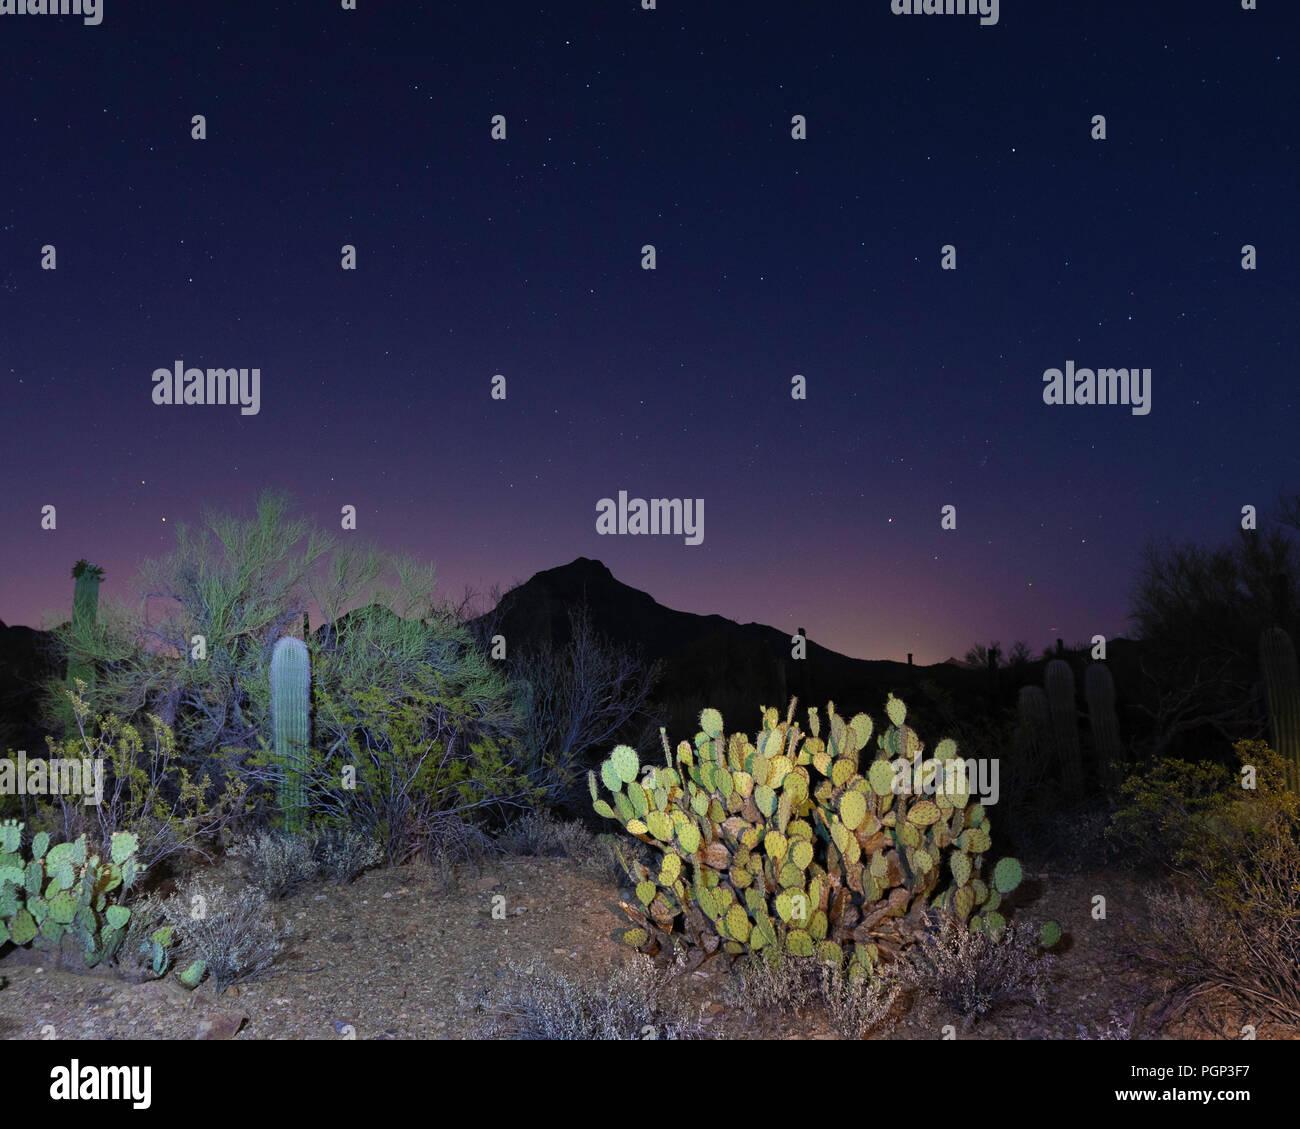 Night sky, starry night, Tucson, Arizona - Stock Image